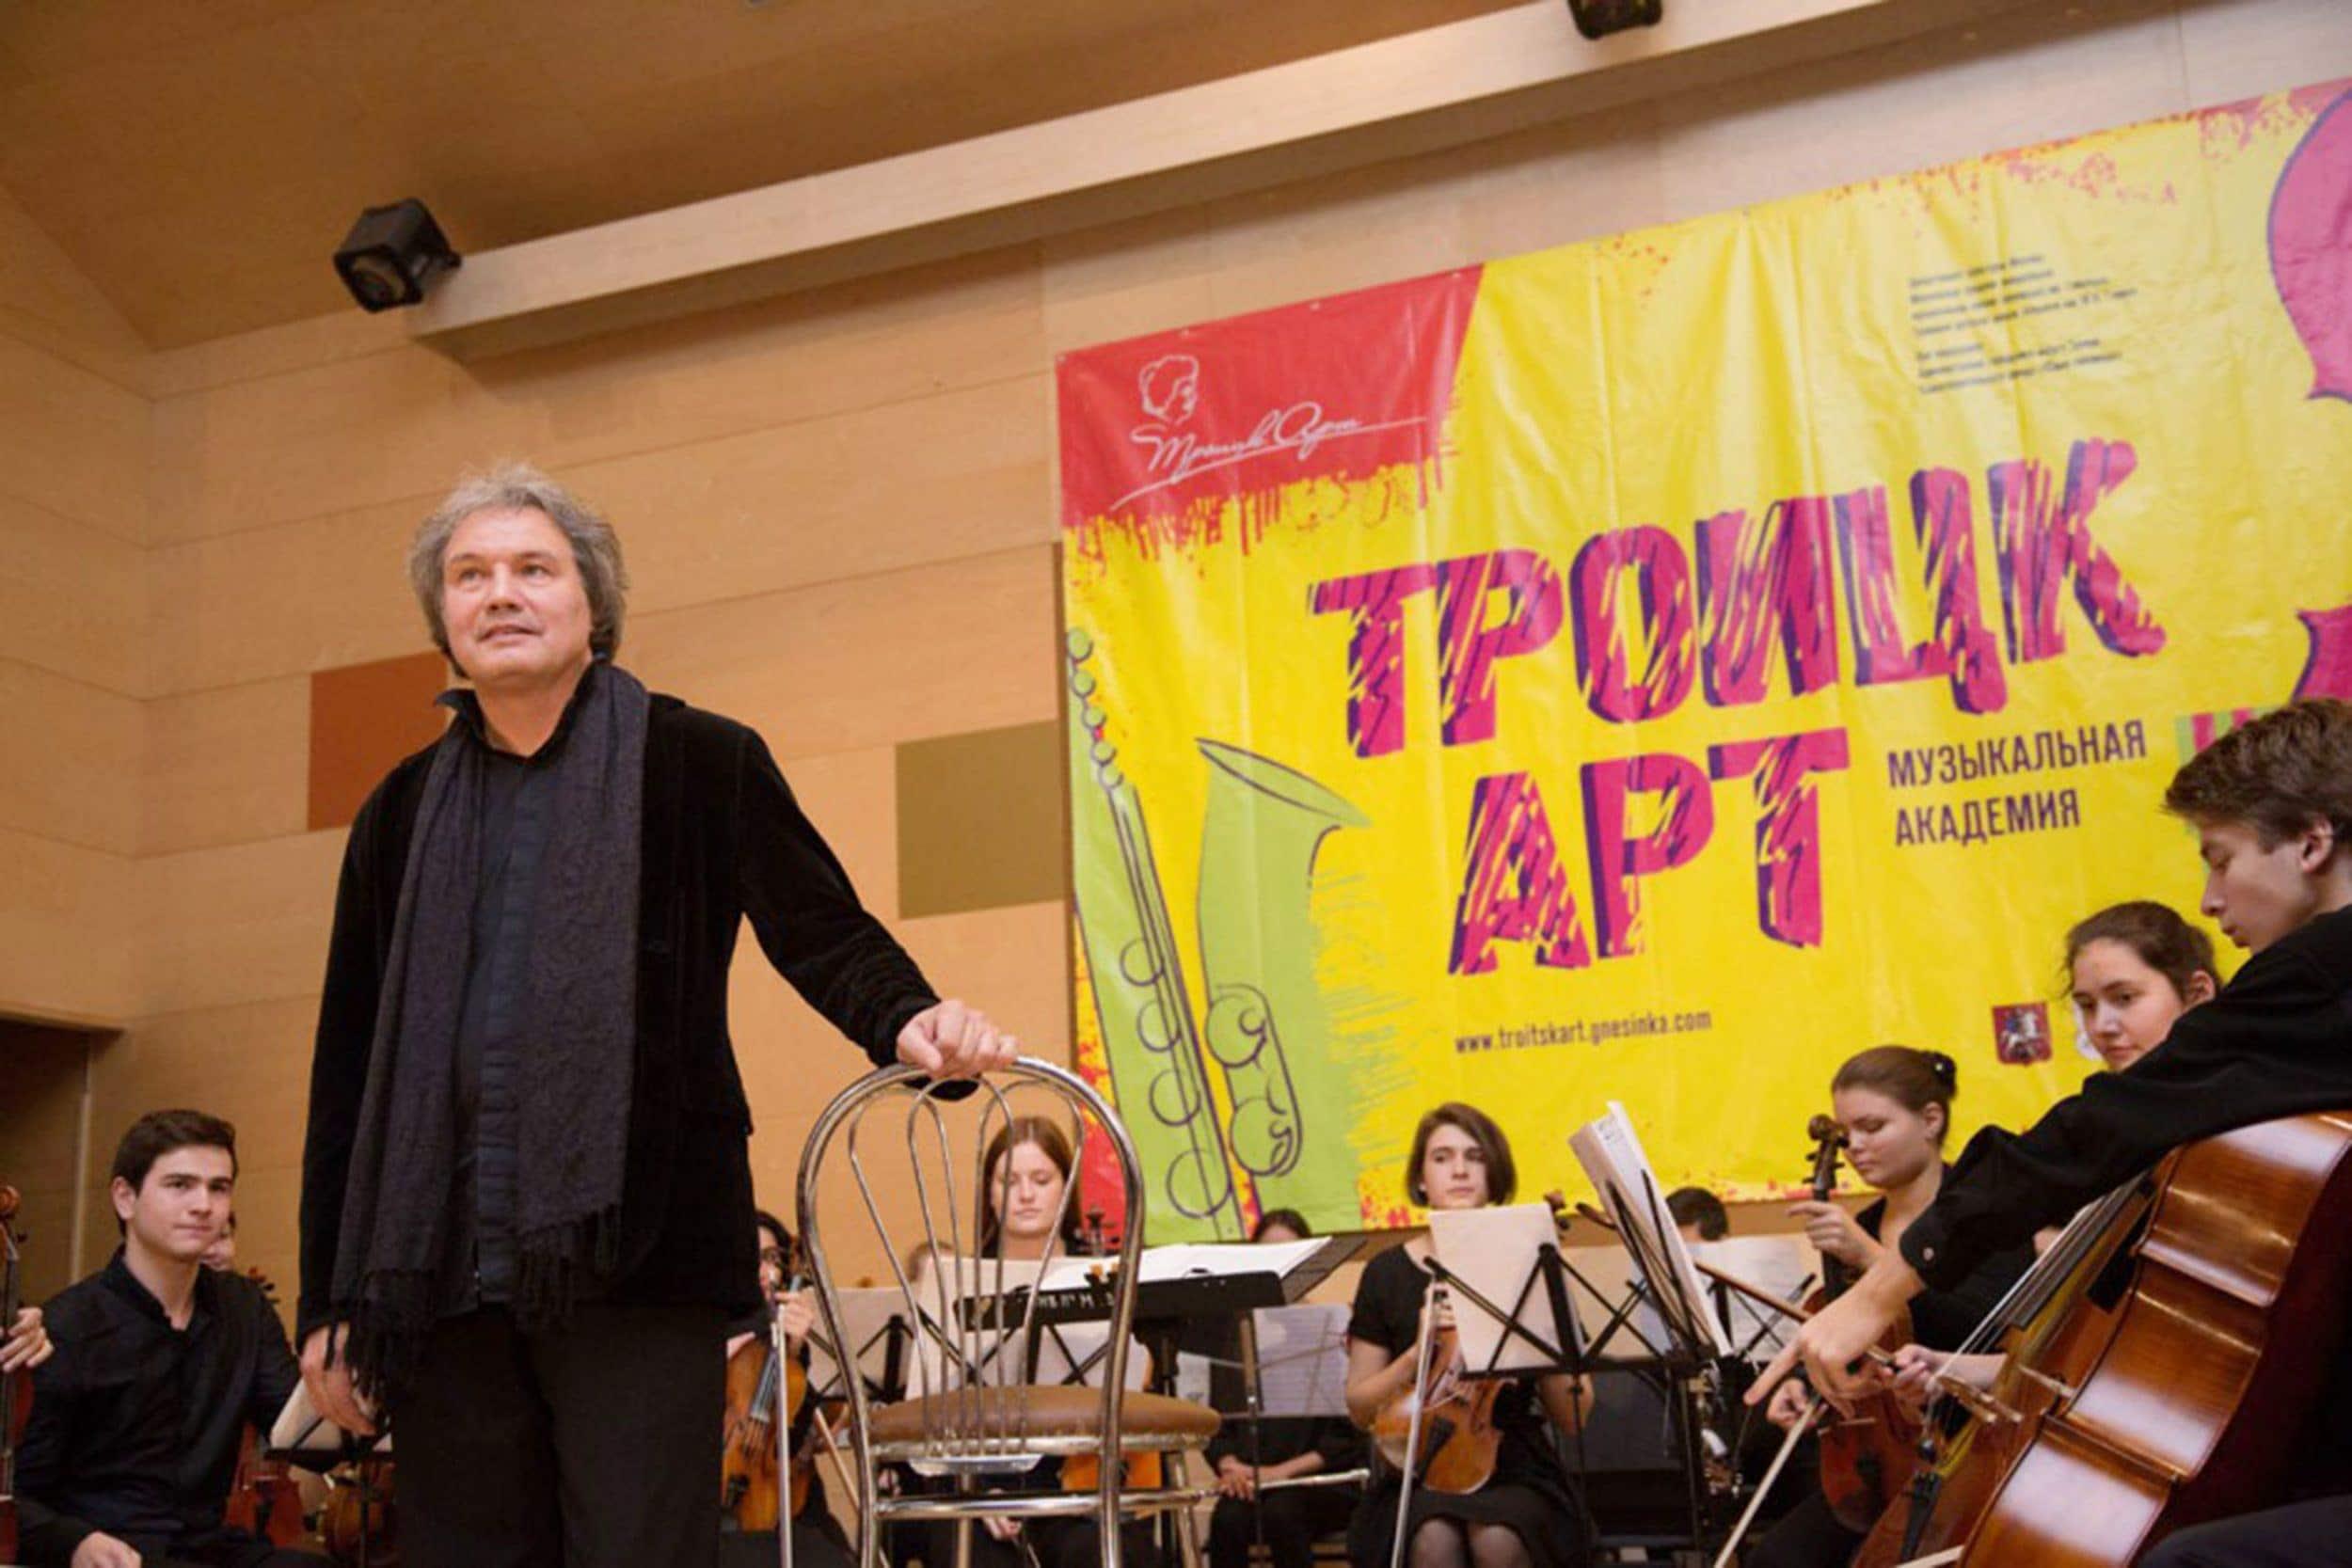 http://www.classicalmusicnews.ru/wp-content/uploads/2014/09/Mihail-Hohlov.jpg